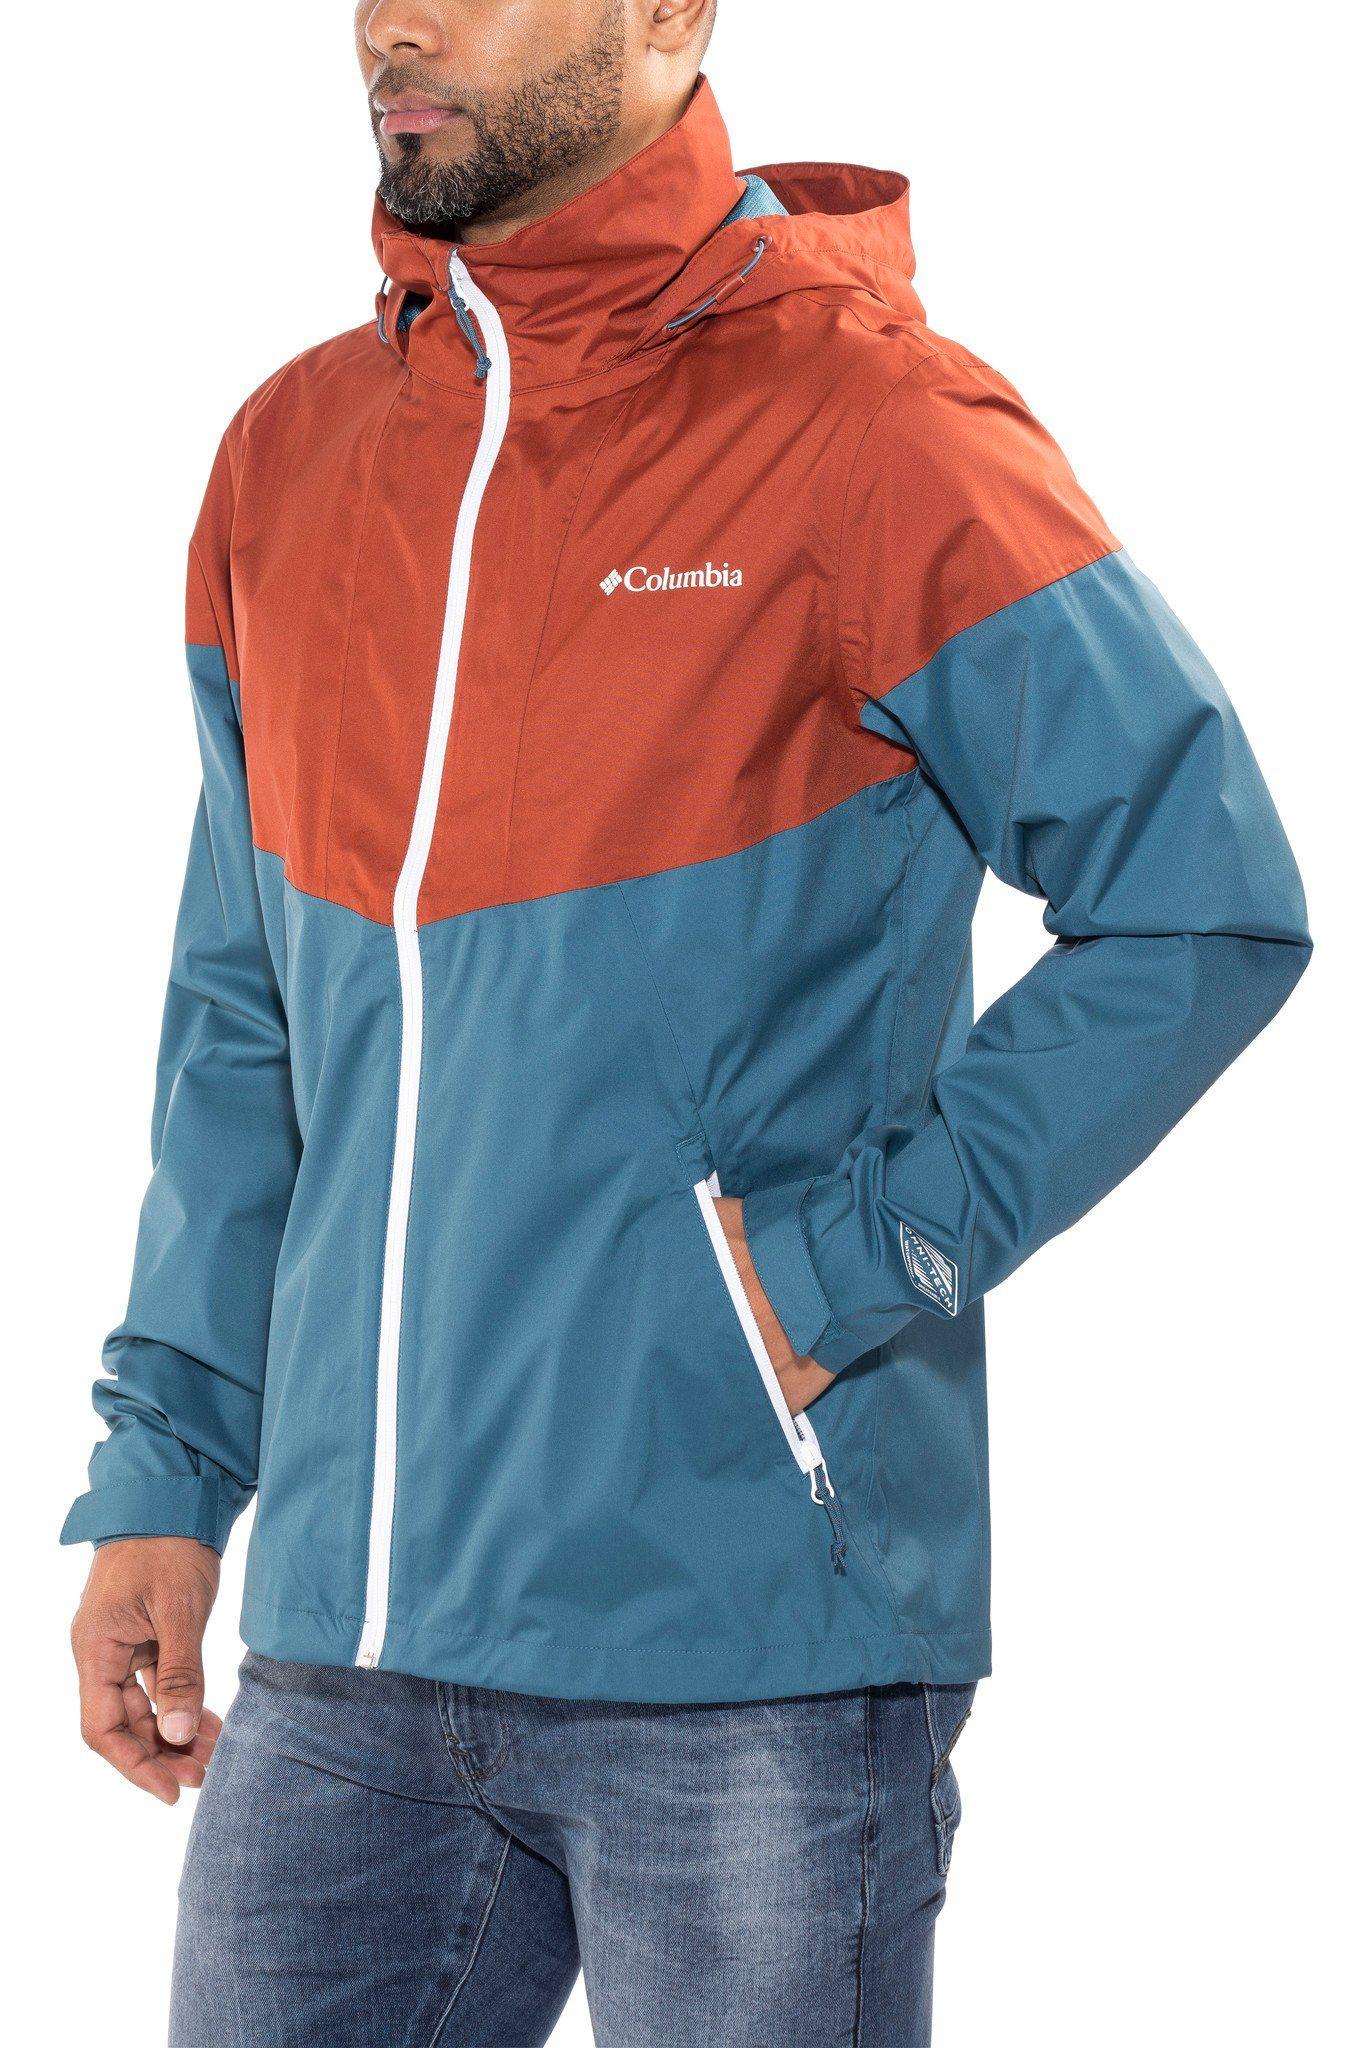 Columbia Outdoorjacke »Inner Limits Jacket Men«